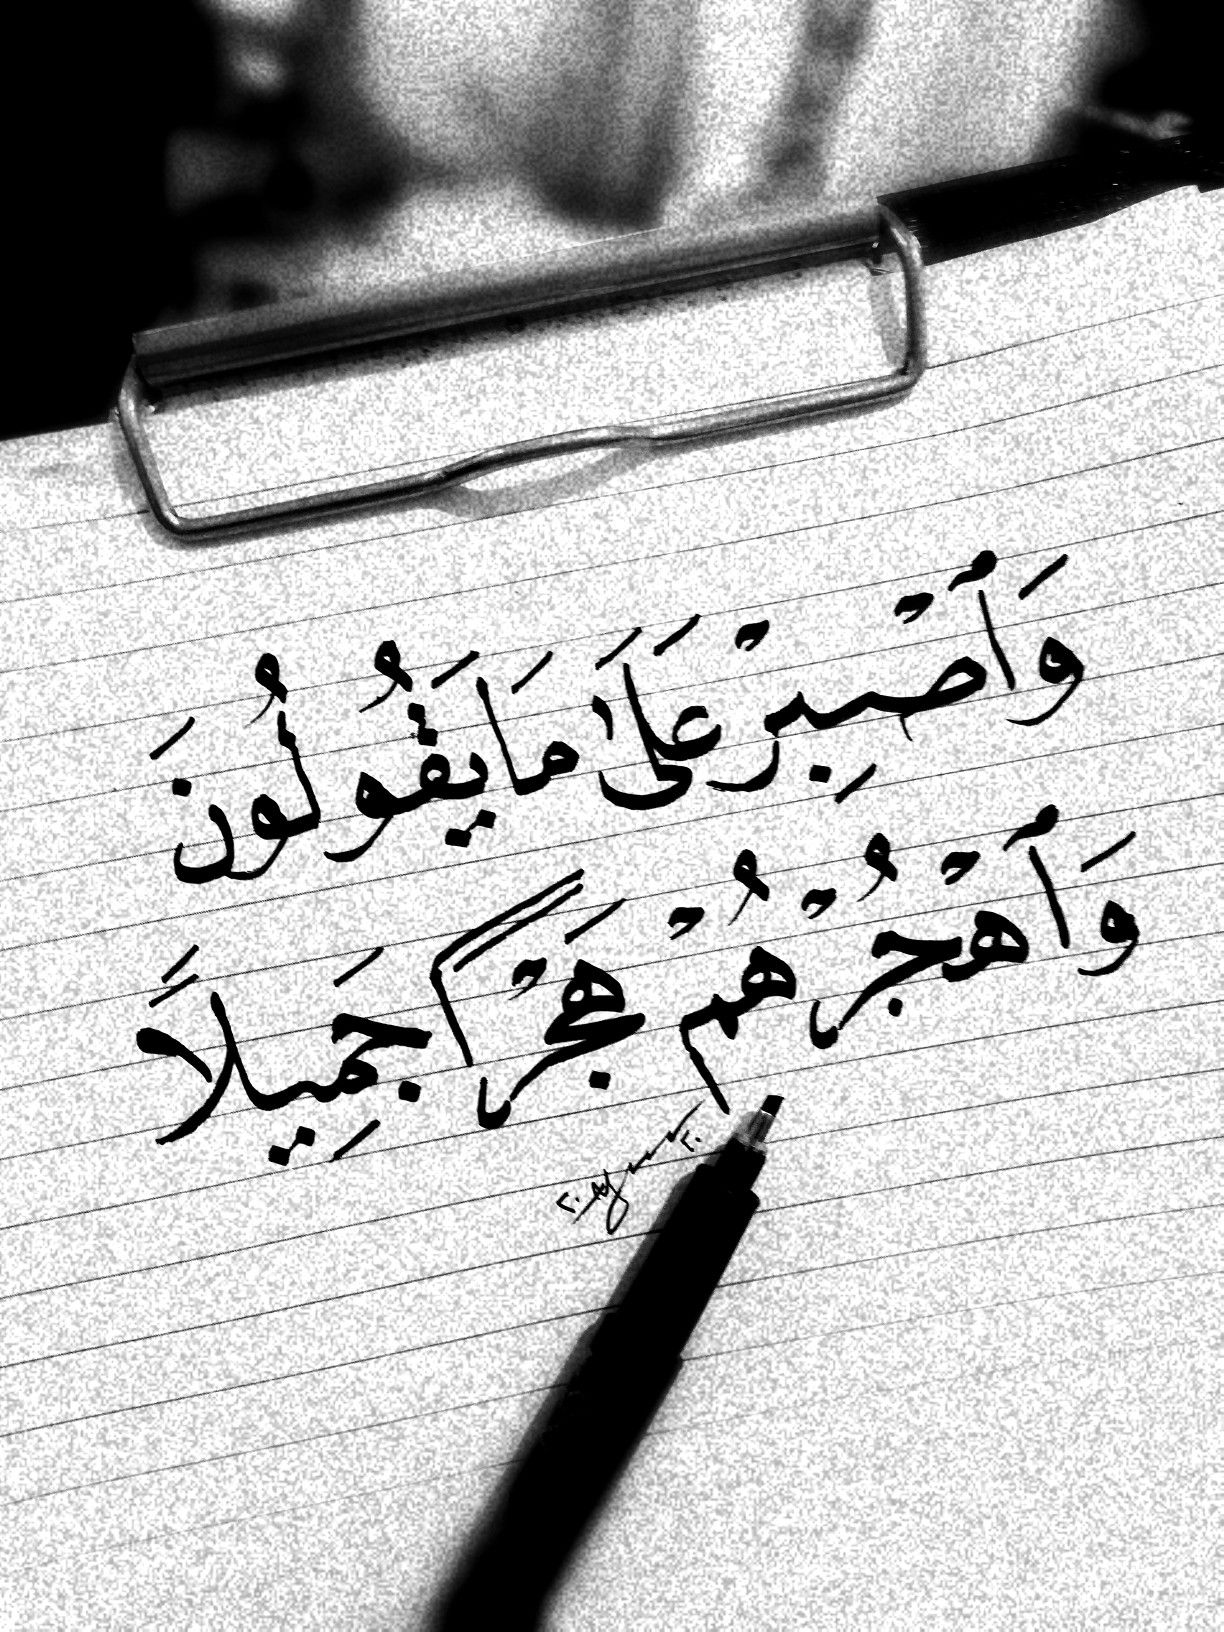 واصبر على ما يقولون واهجرهم هجرا جميلا Quran Quotes Quran Quotes Love Quran Quotes Verses